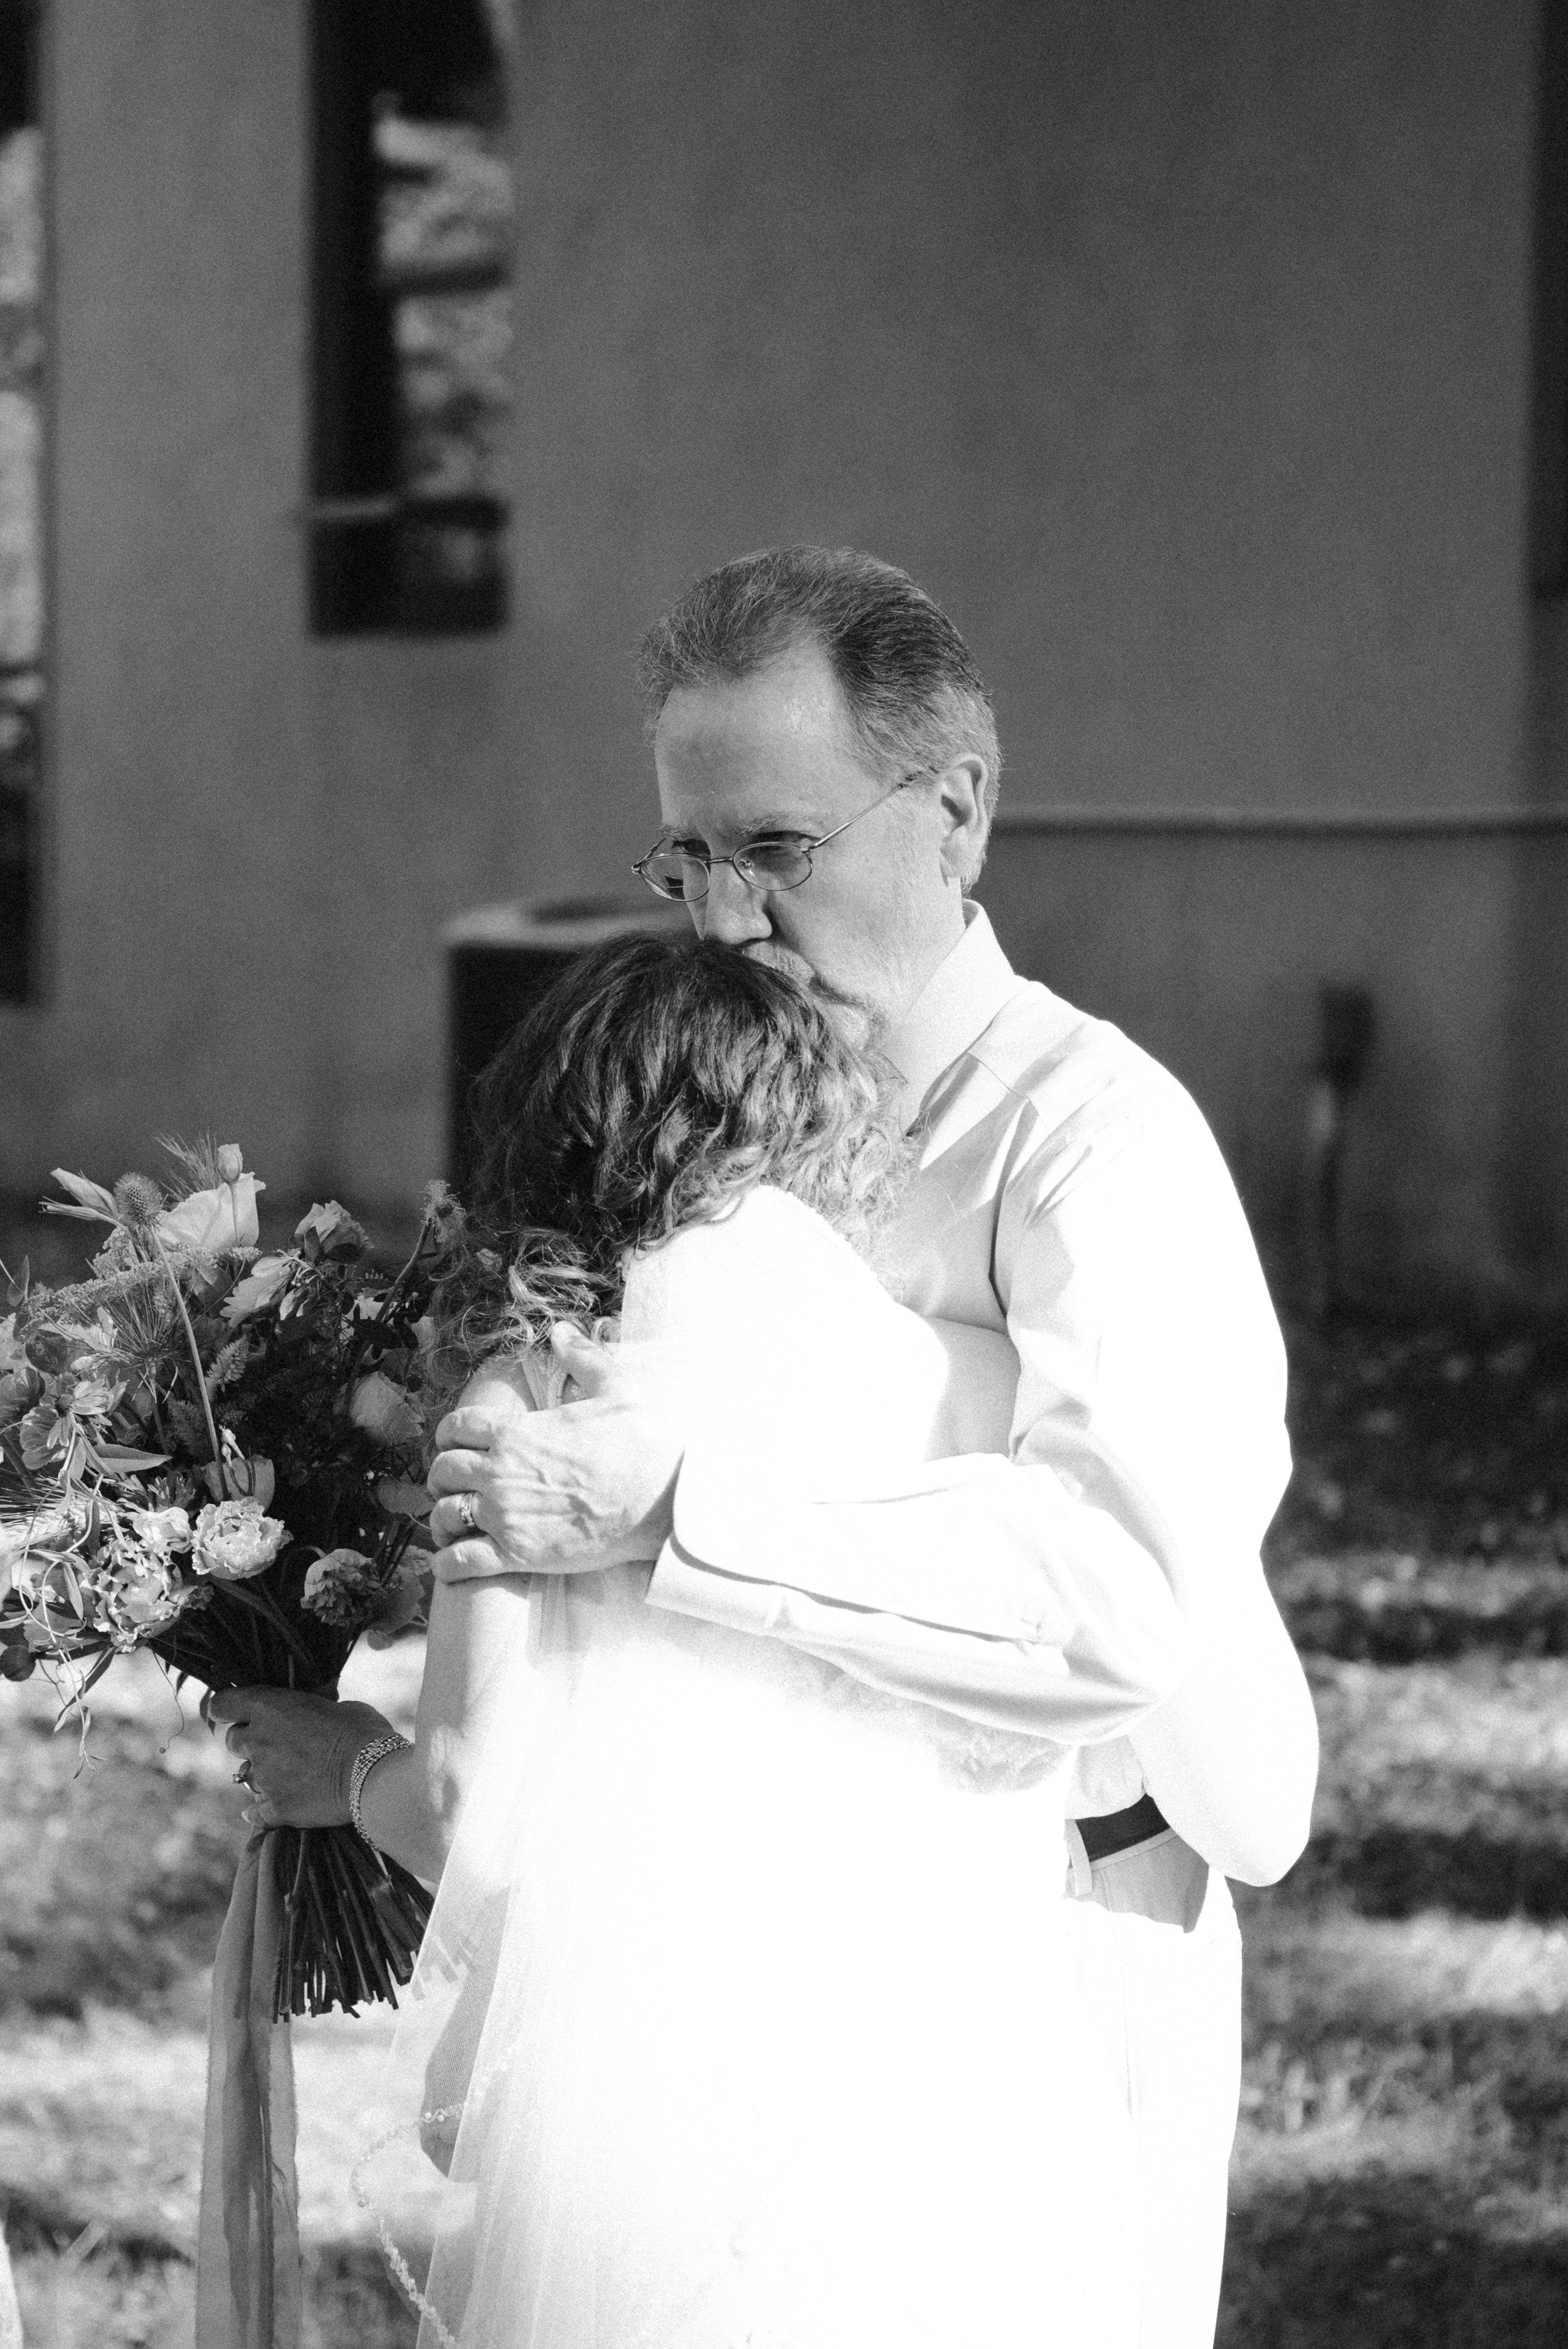 mclaughlin-wedding-447.jpg